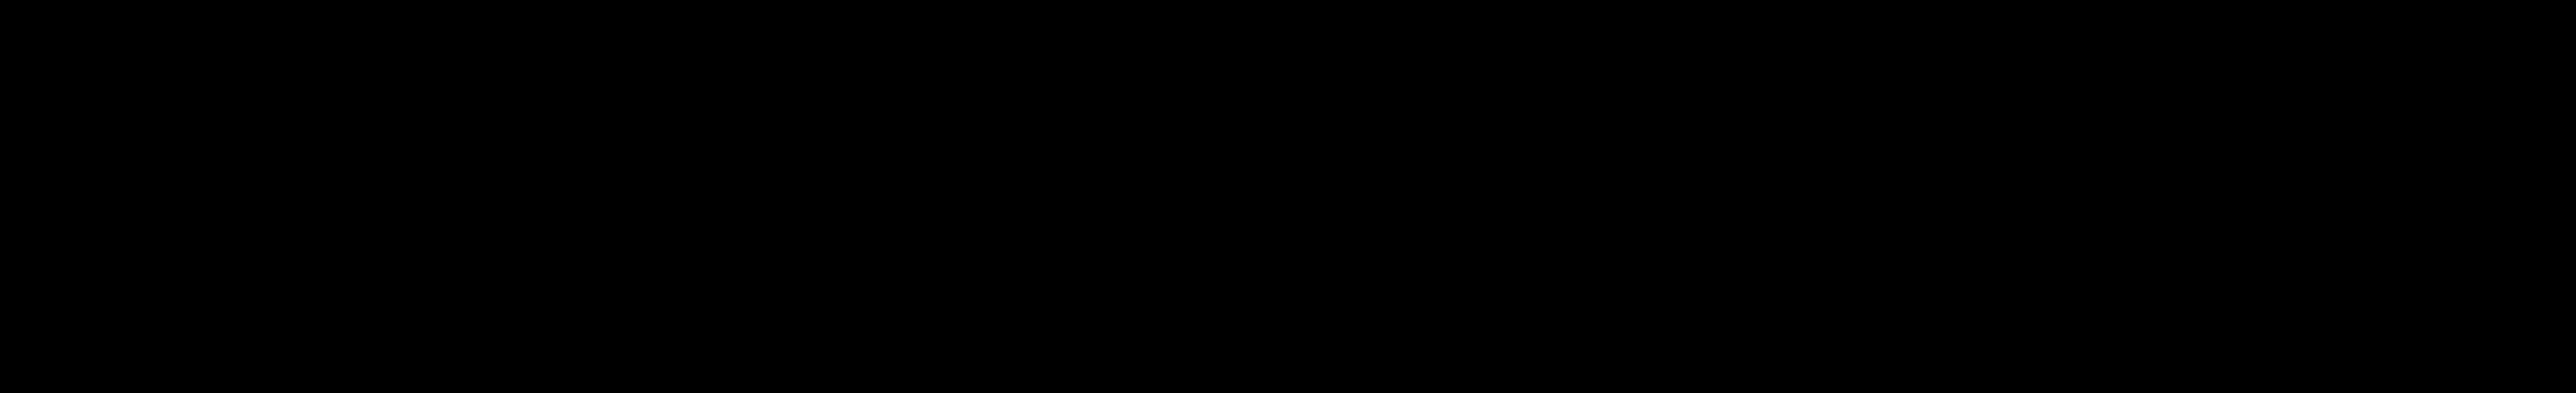 metecanasta